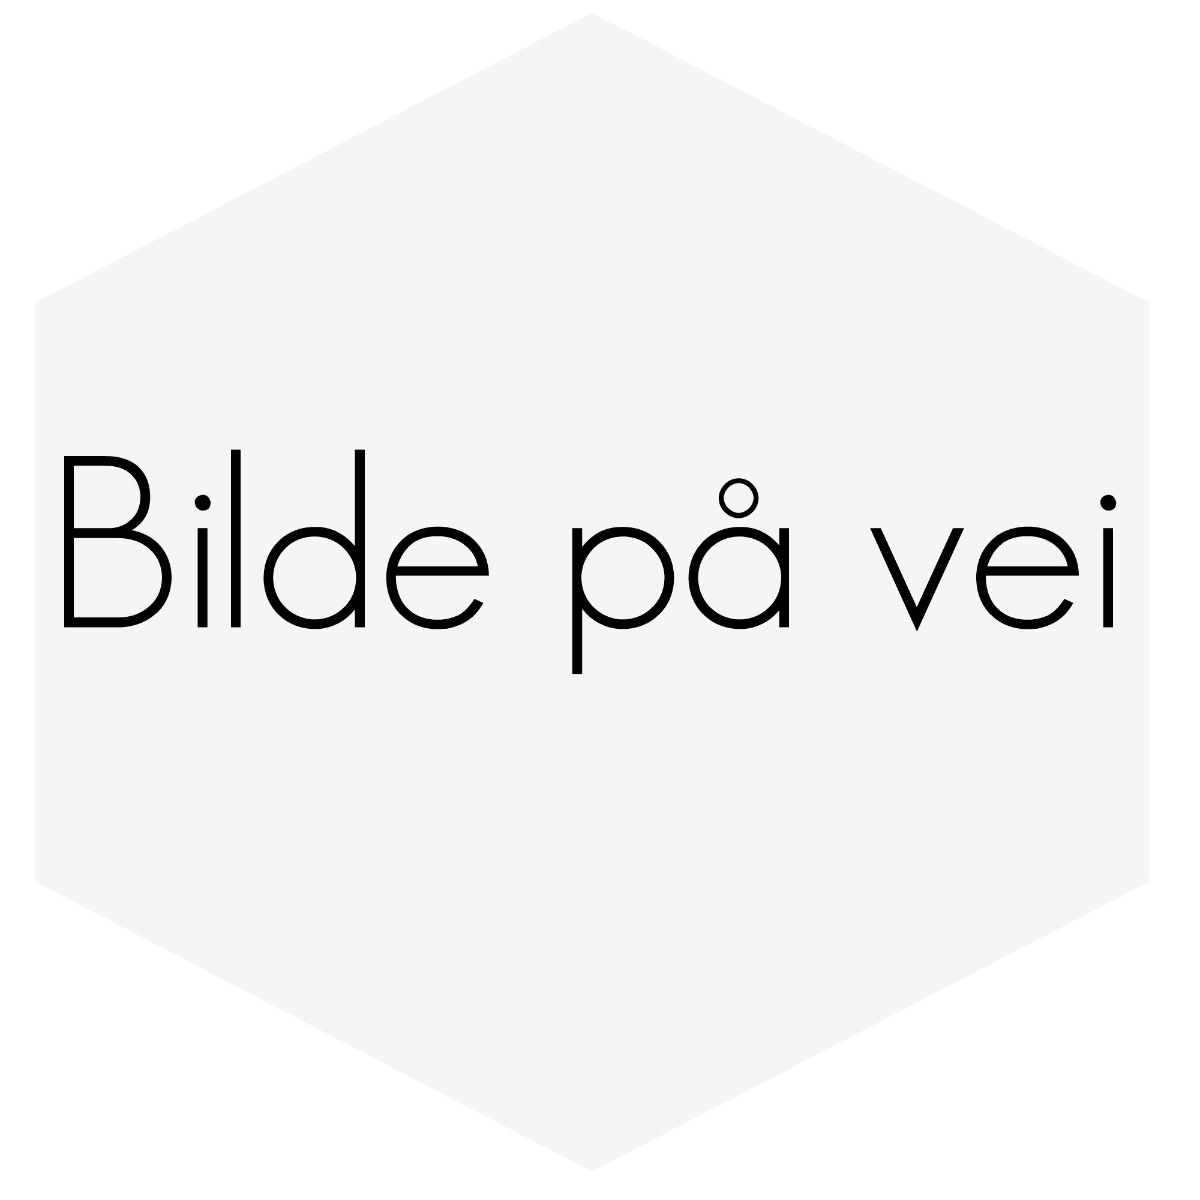 STYRELEDD NEDE PÅ RATTSTAMME VOLVO 850 92-96 9140998